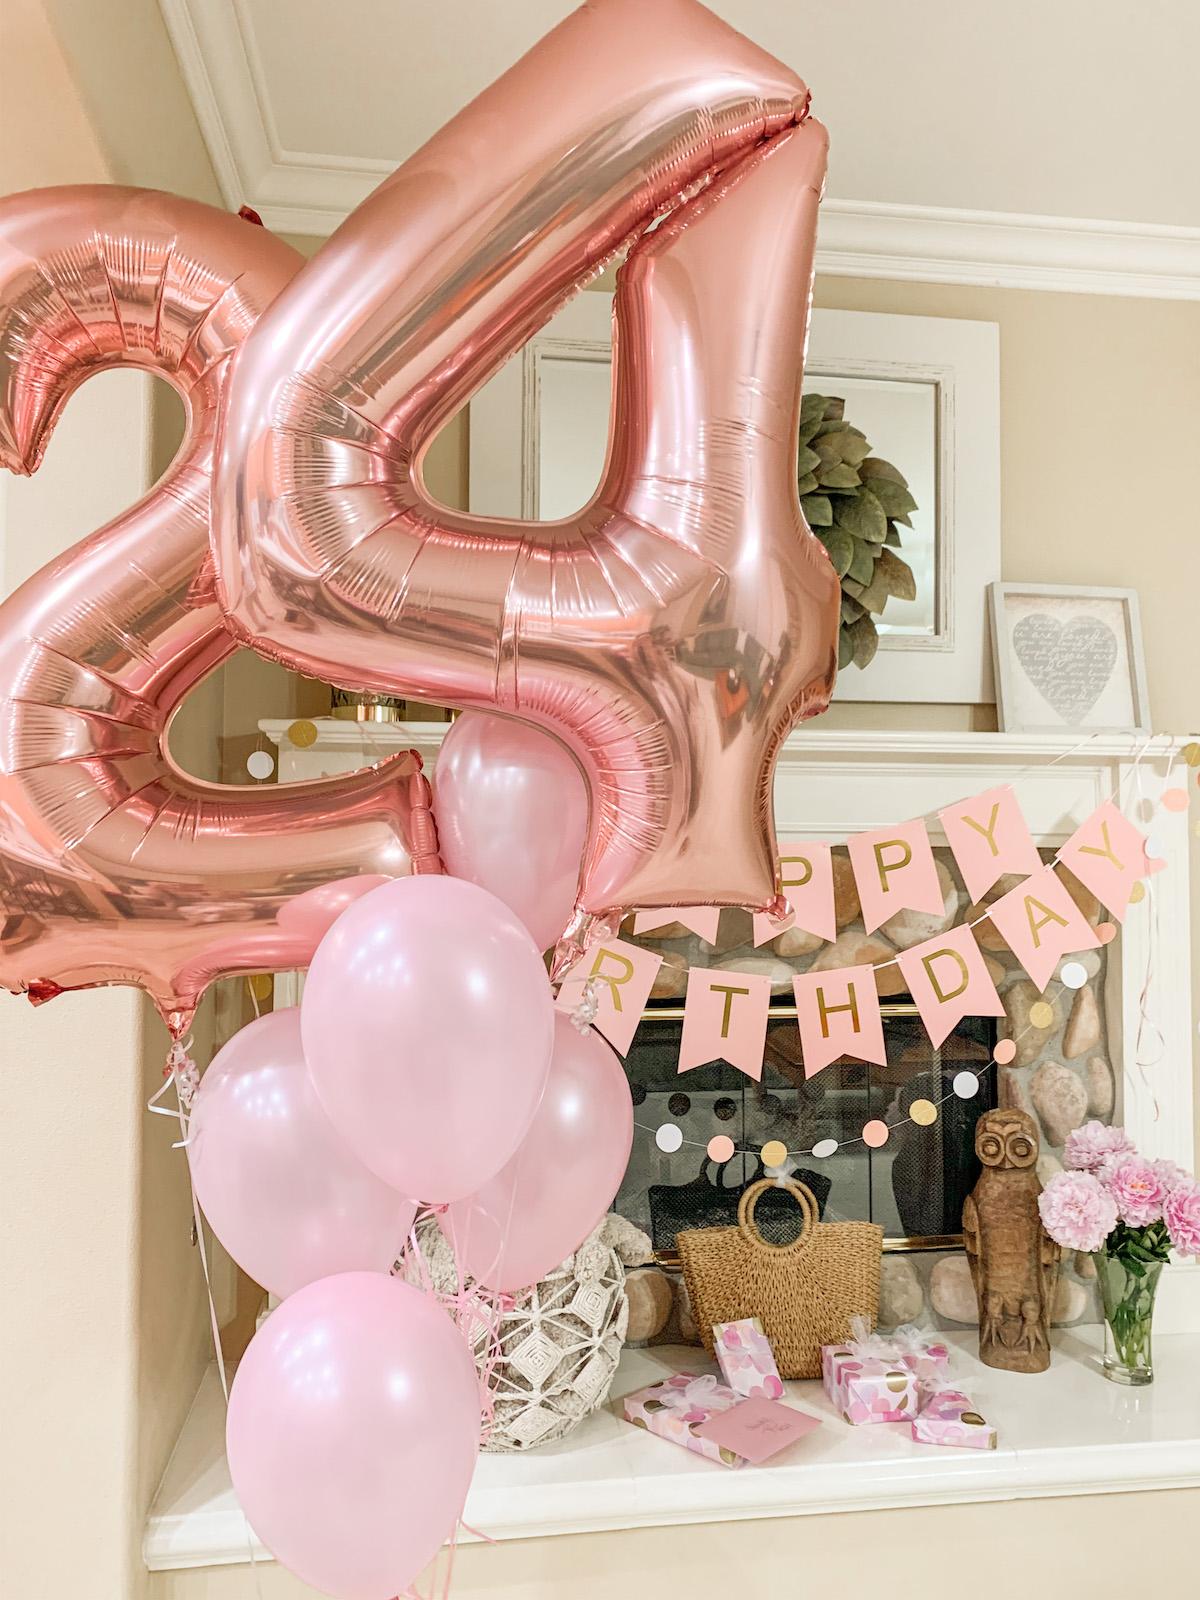 24th birthday balloons rose gold